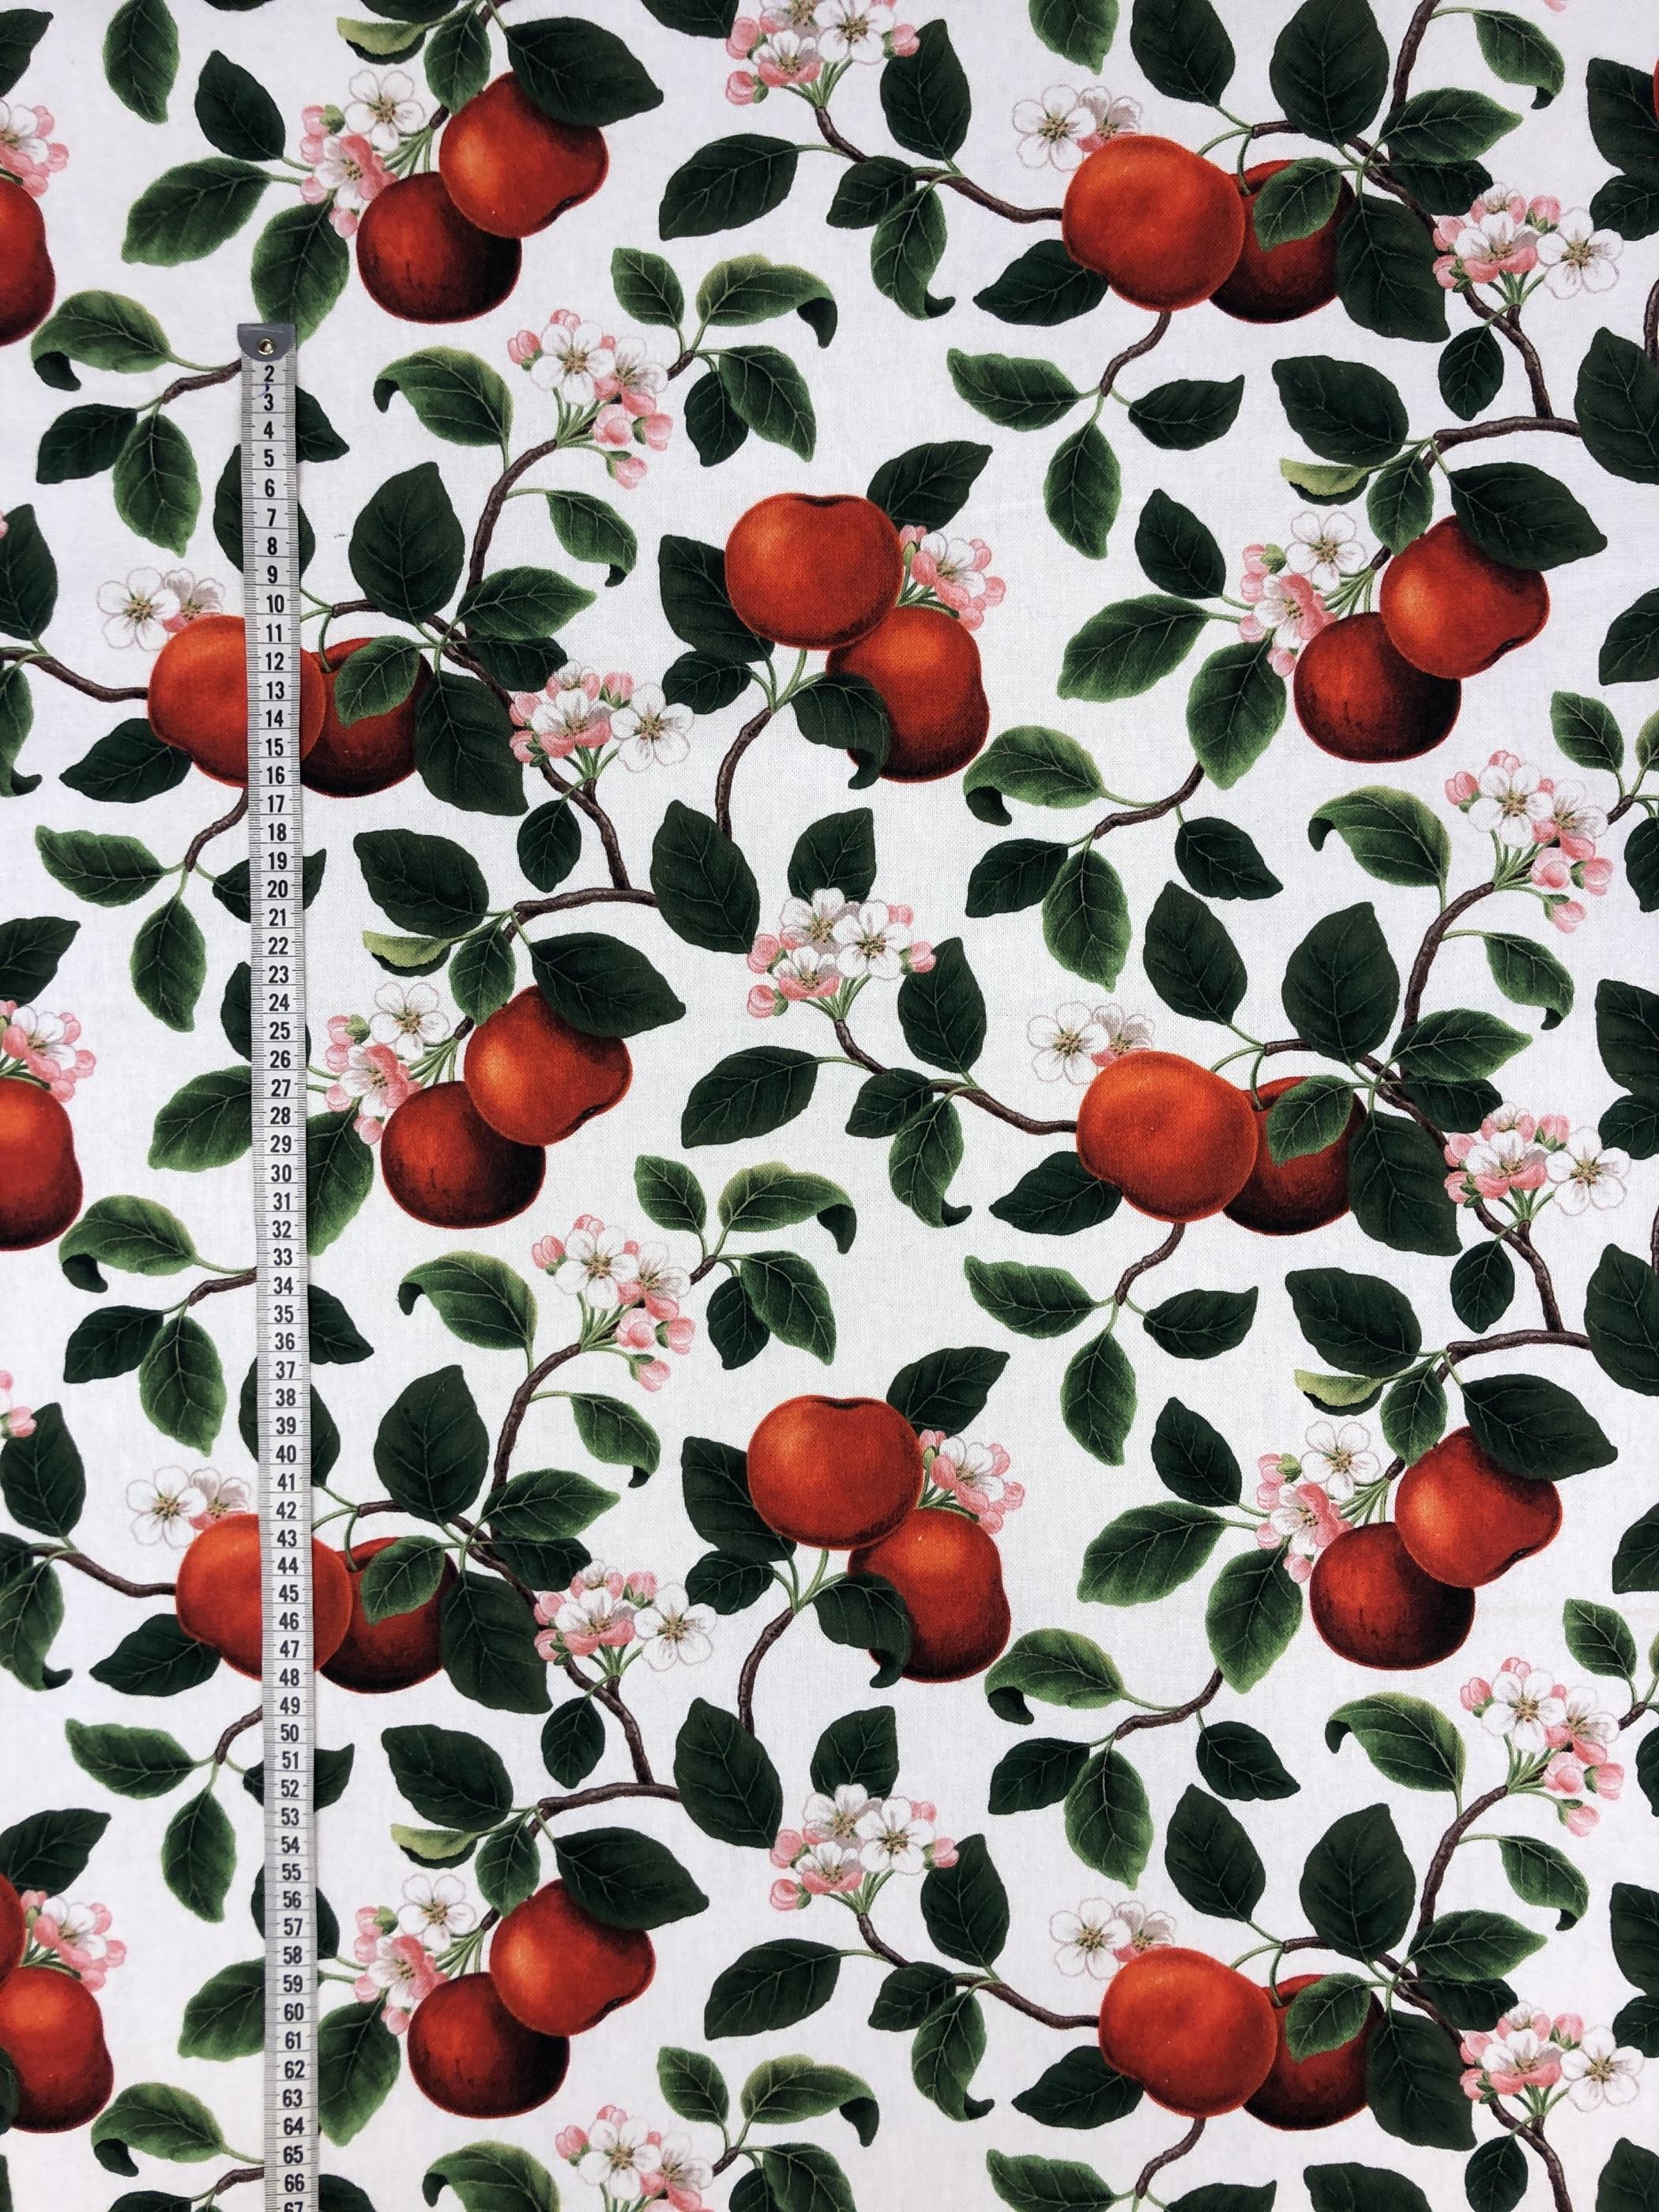 äppel äppelkvistar bomull röd grön vit metervara Tyglust Laholm hemtextil